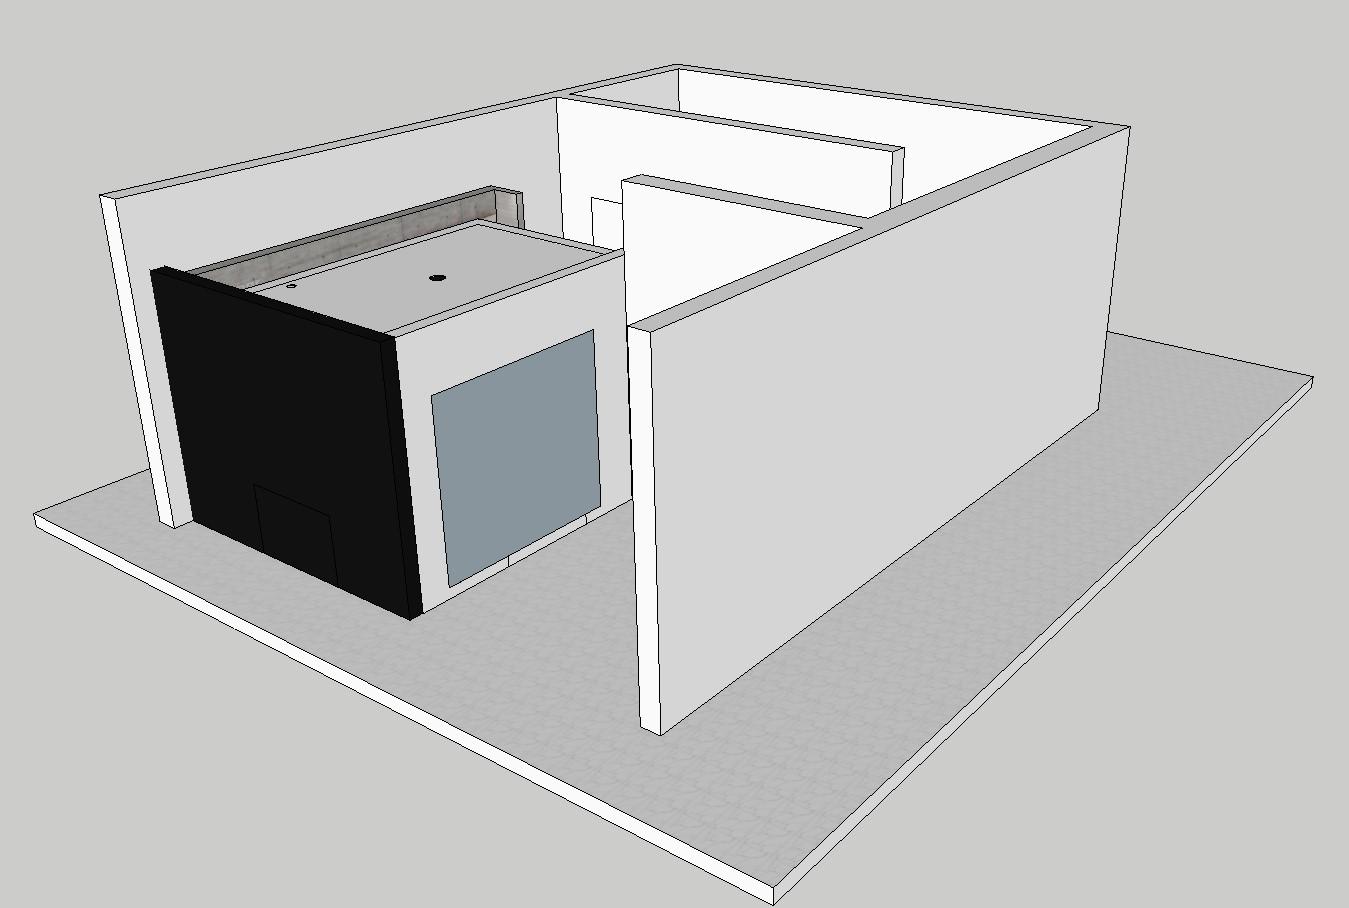 Office cabin partition furniture 3d drawing details skp file